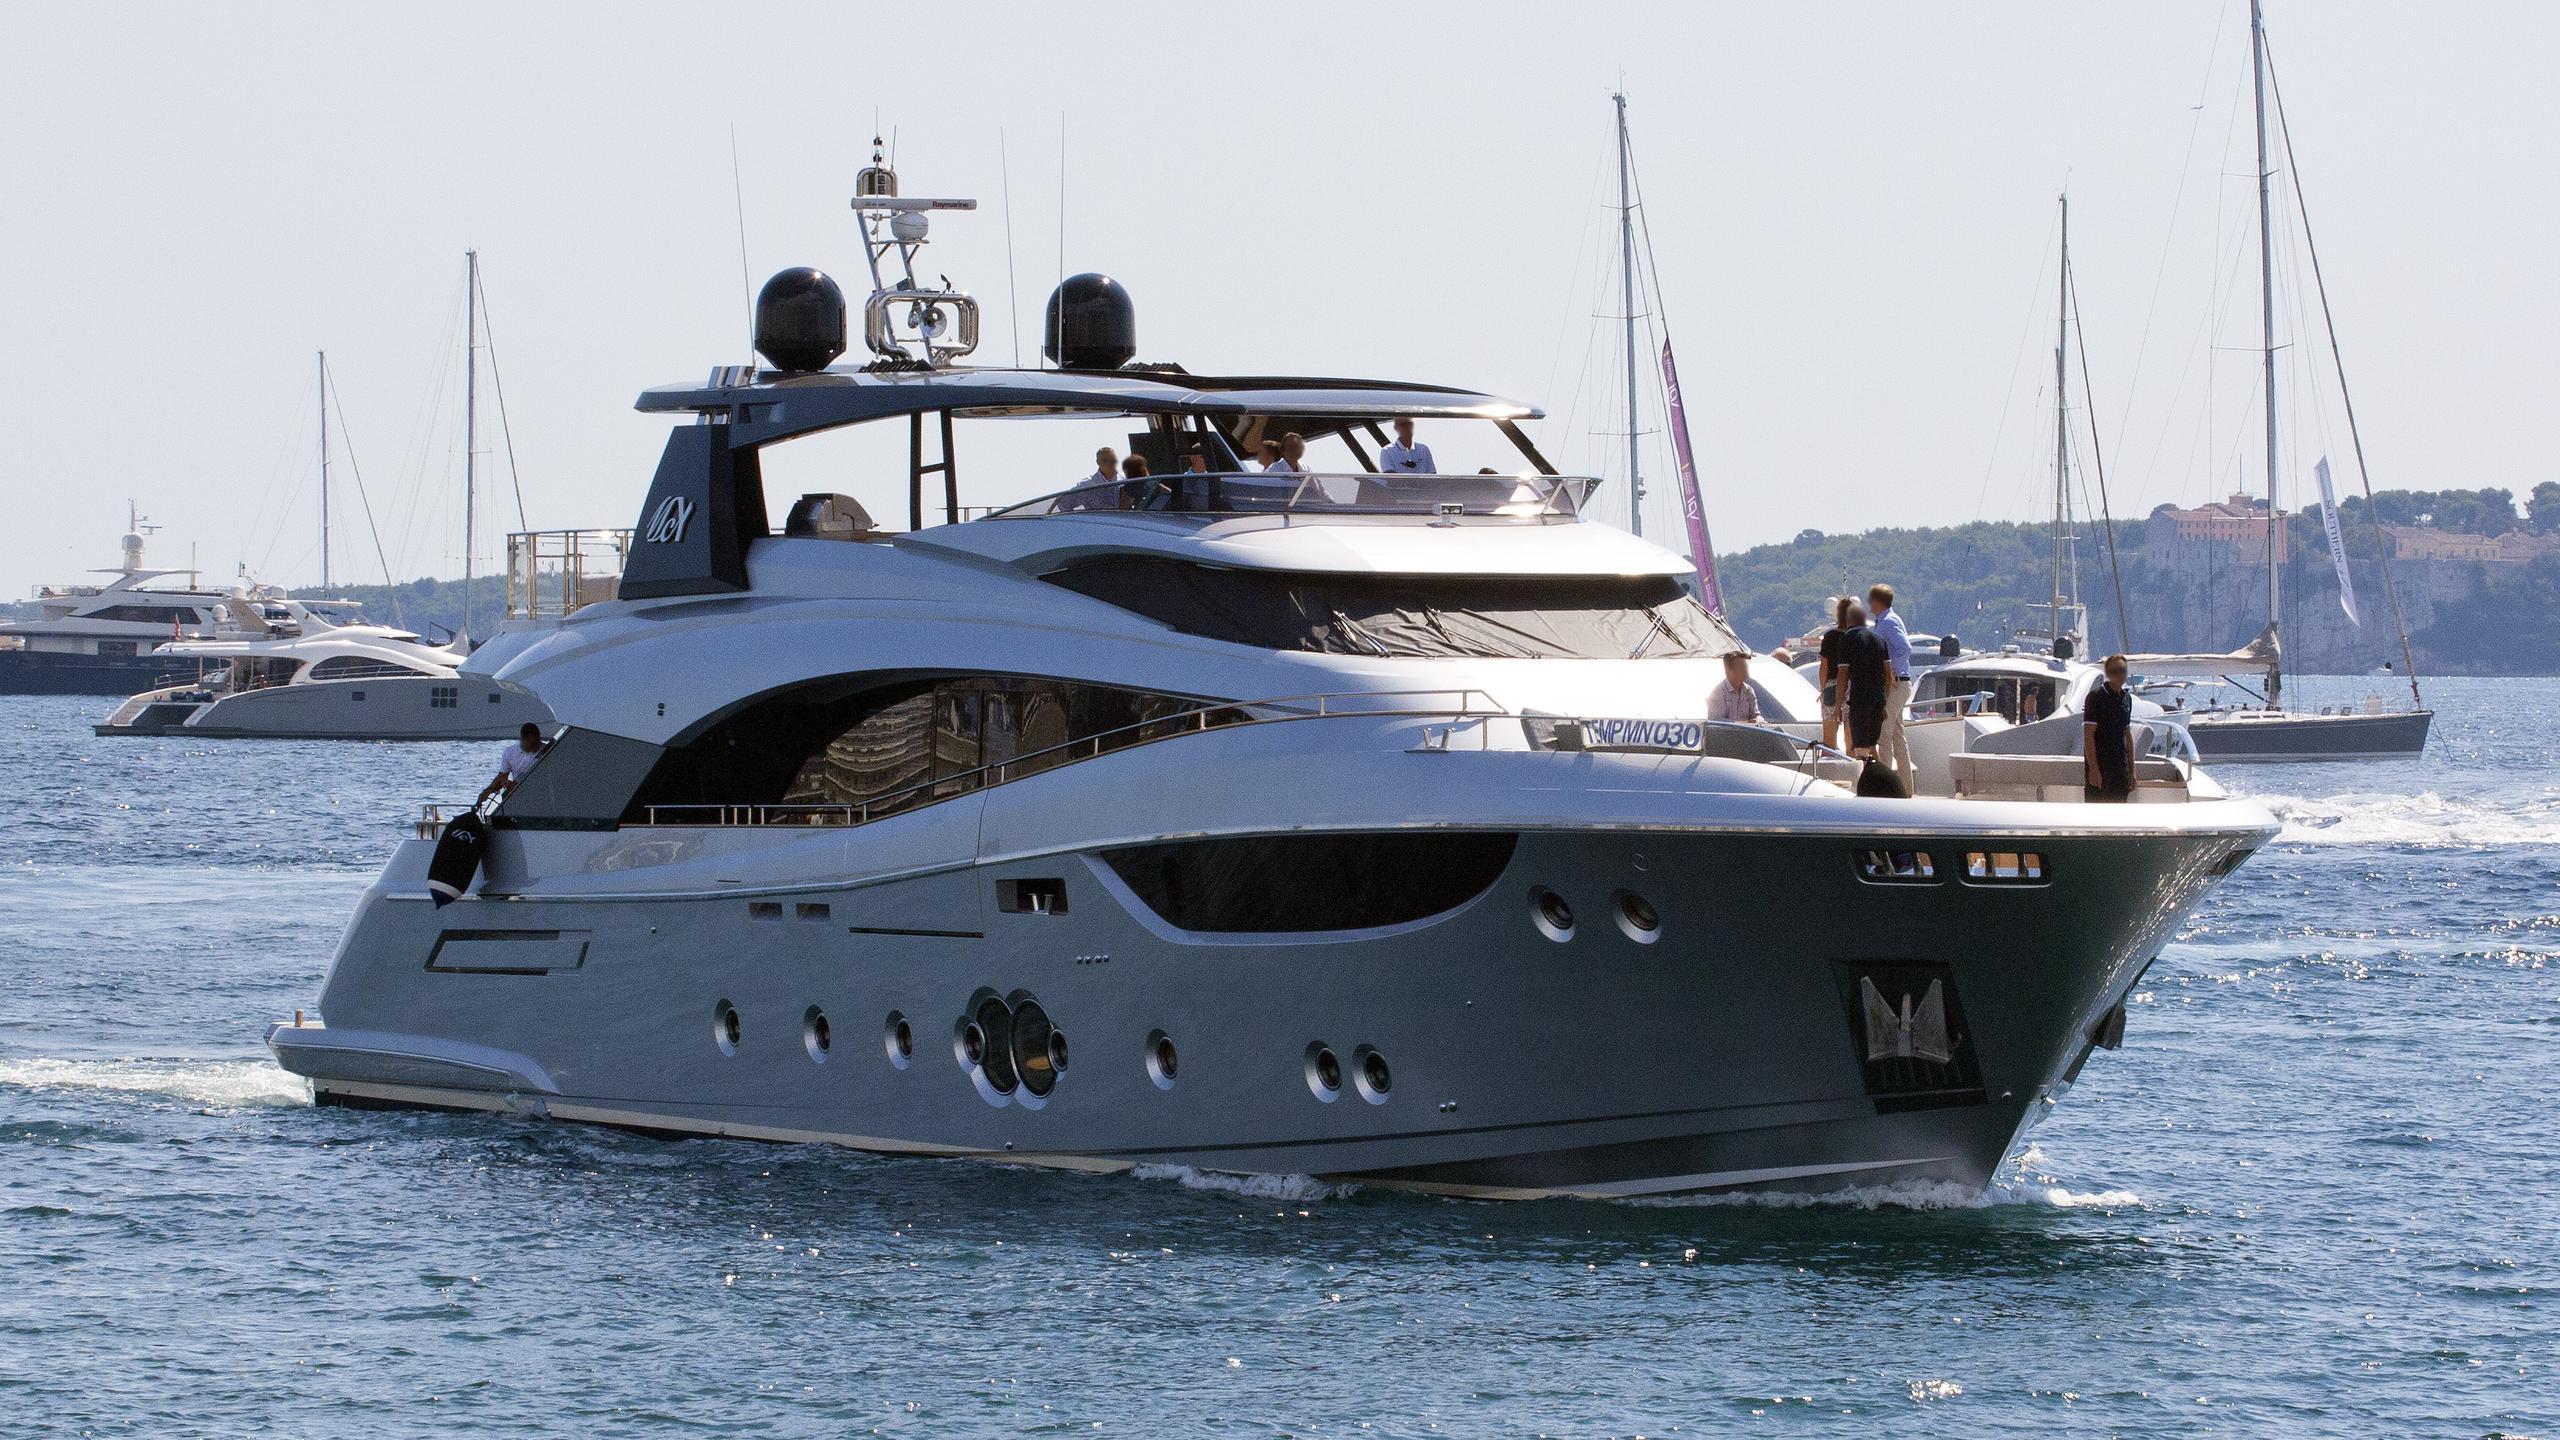 monte-carlo-yachts-105-hull-1-g-2015-32m-nuvolari-lenard-motor-yacht-running